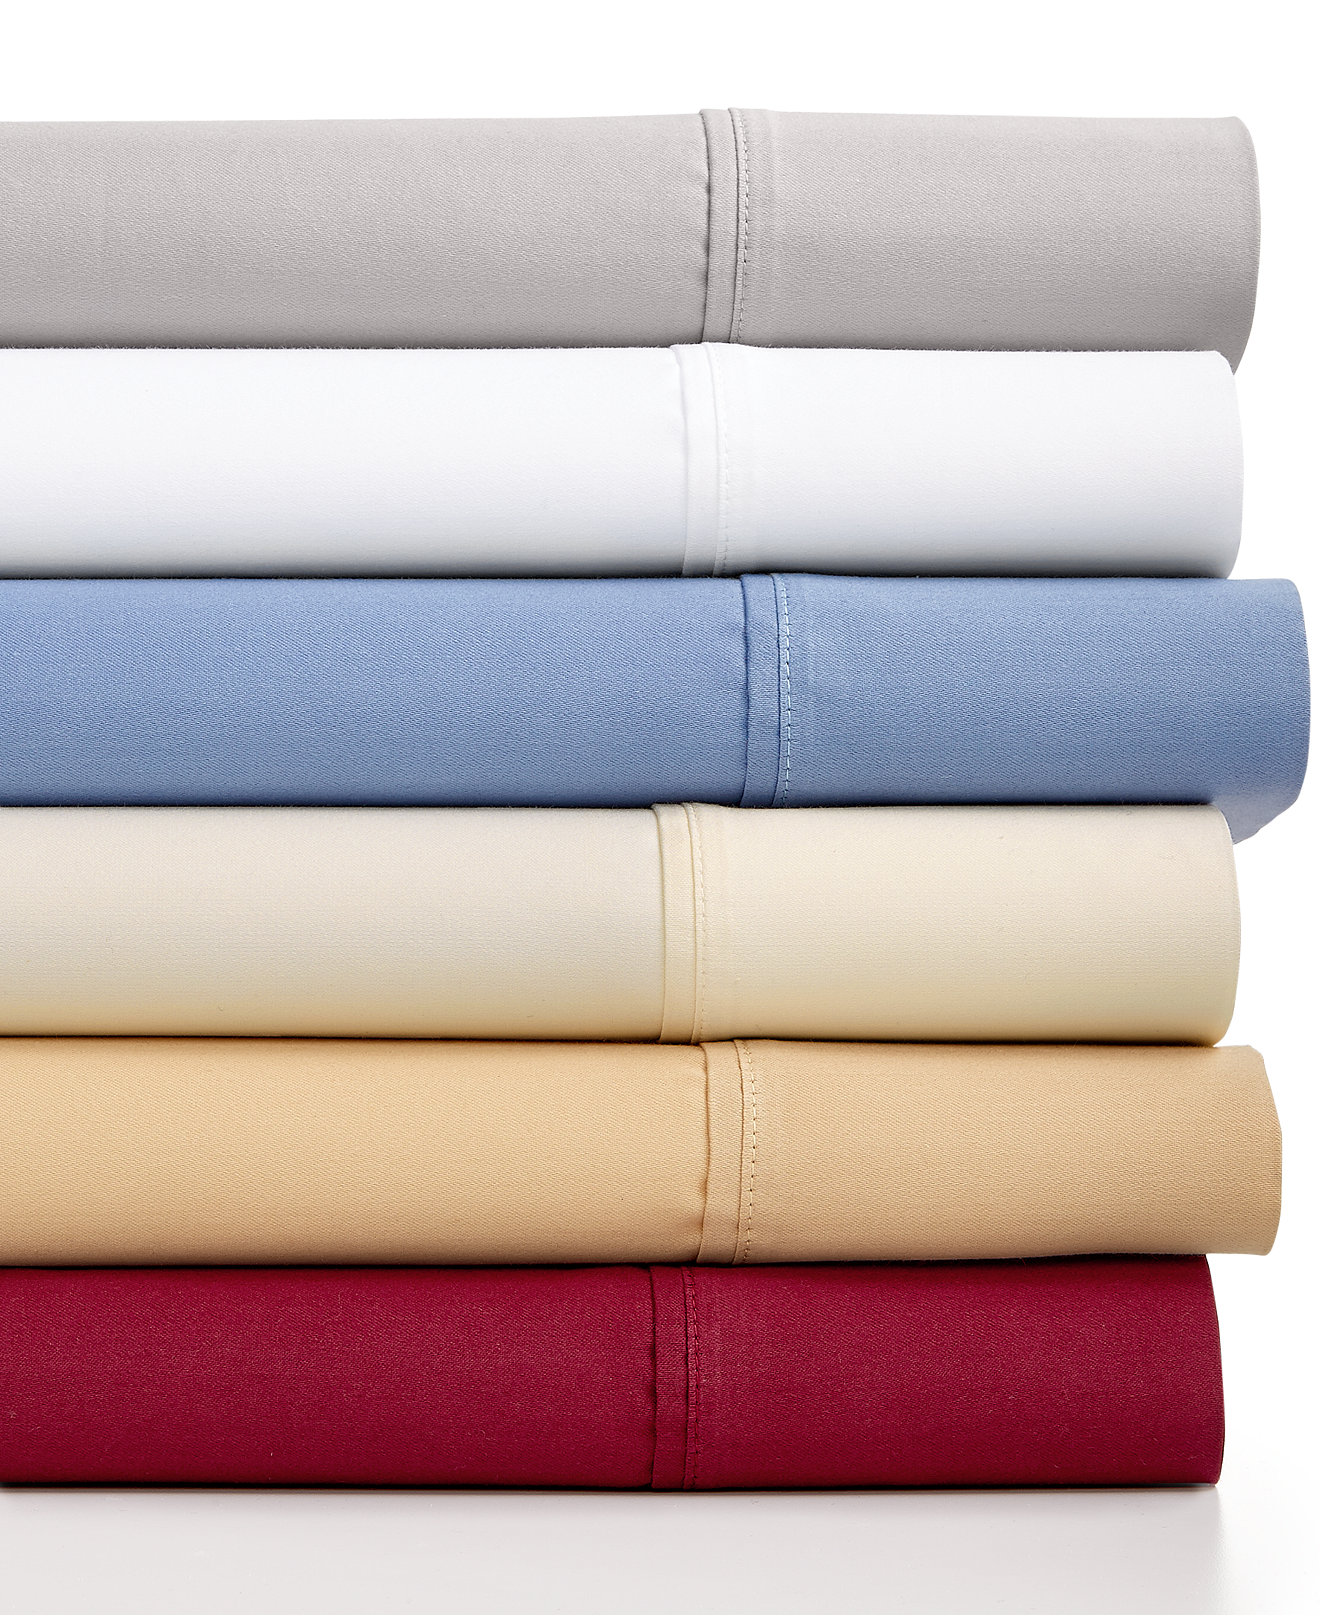 Bed Sheets Macys